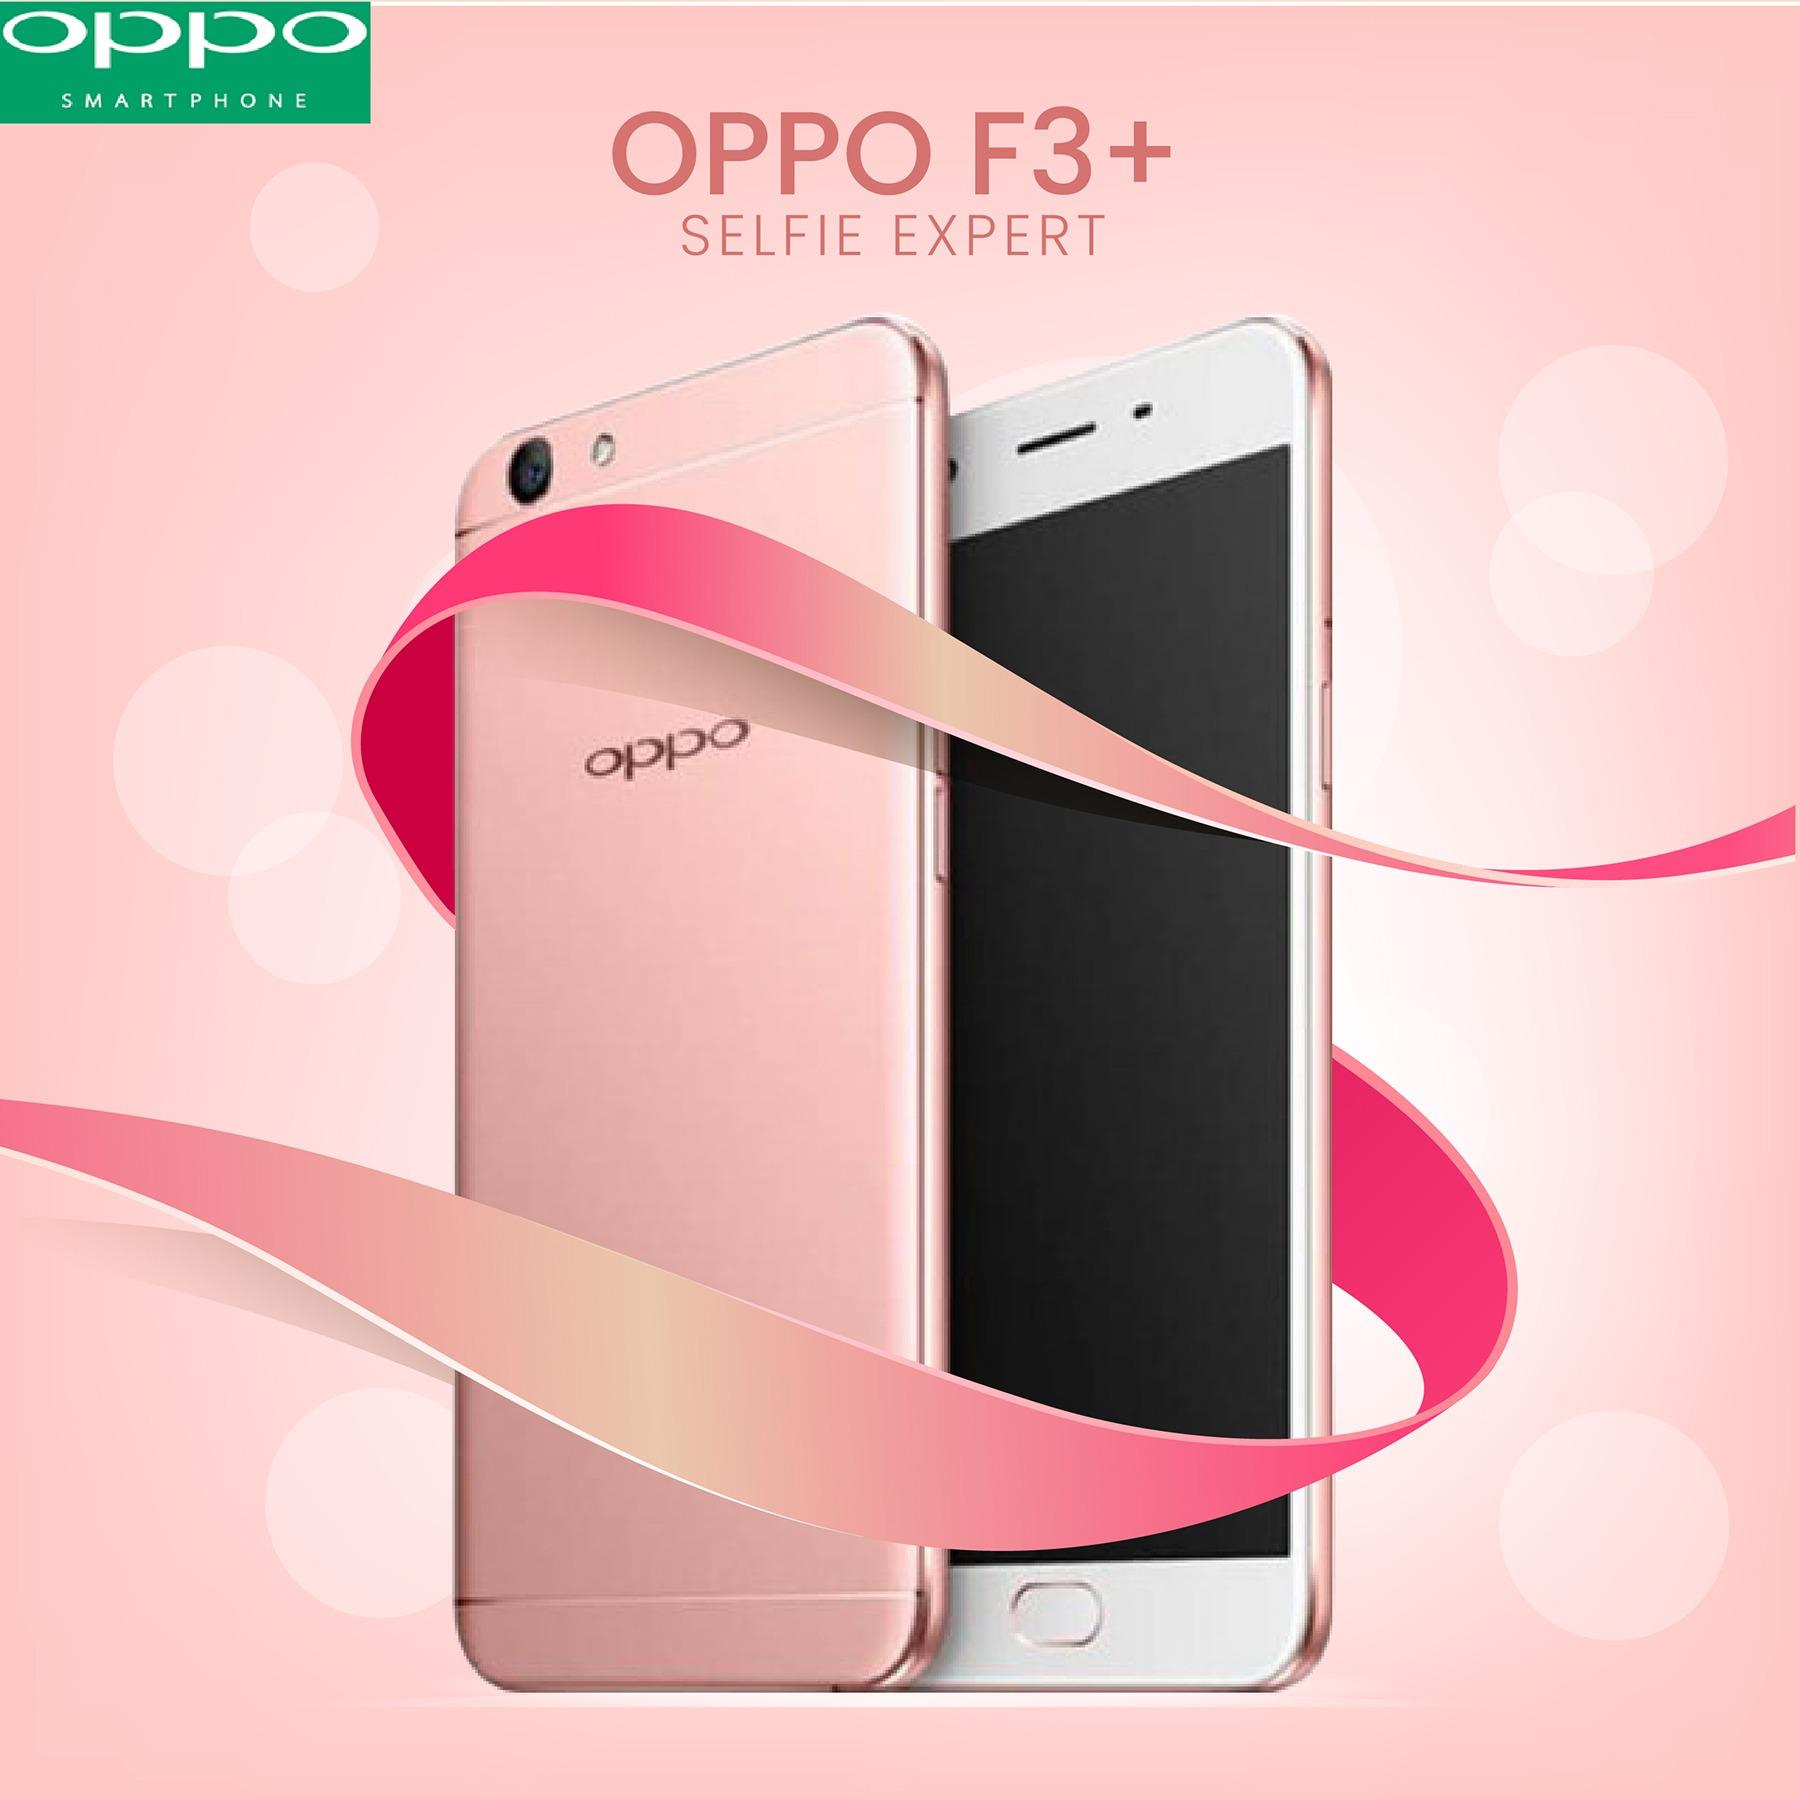 Oppo F3 Plus Selfie Expert 64 GB Ram 4 GB HARGA SPESIAL Gold FREE VR BOX